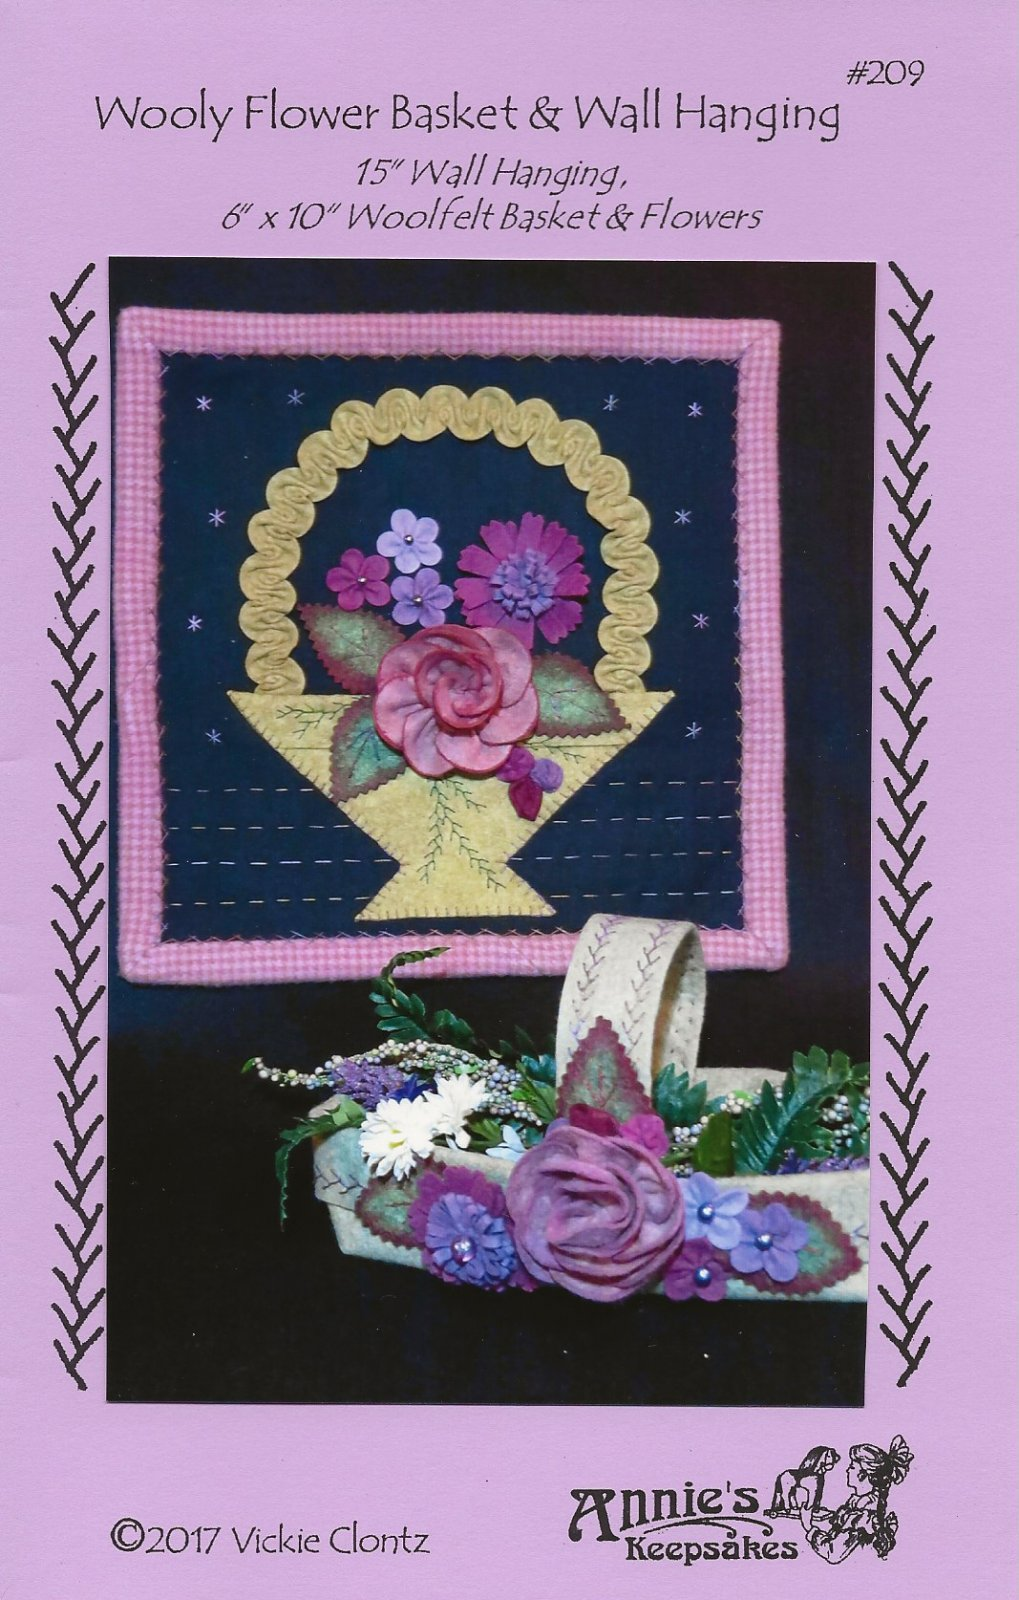 Wooly Flower Basket & Wall Hanging